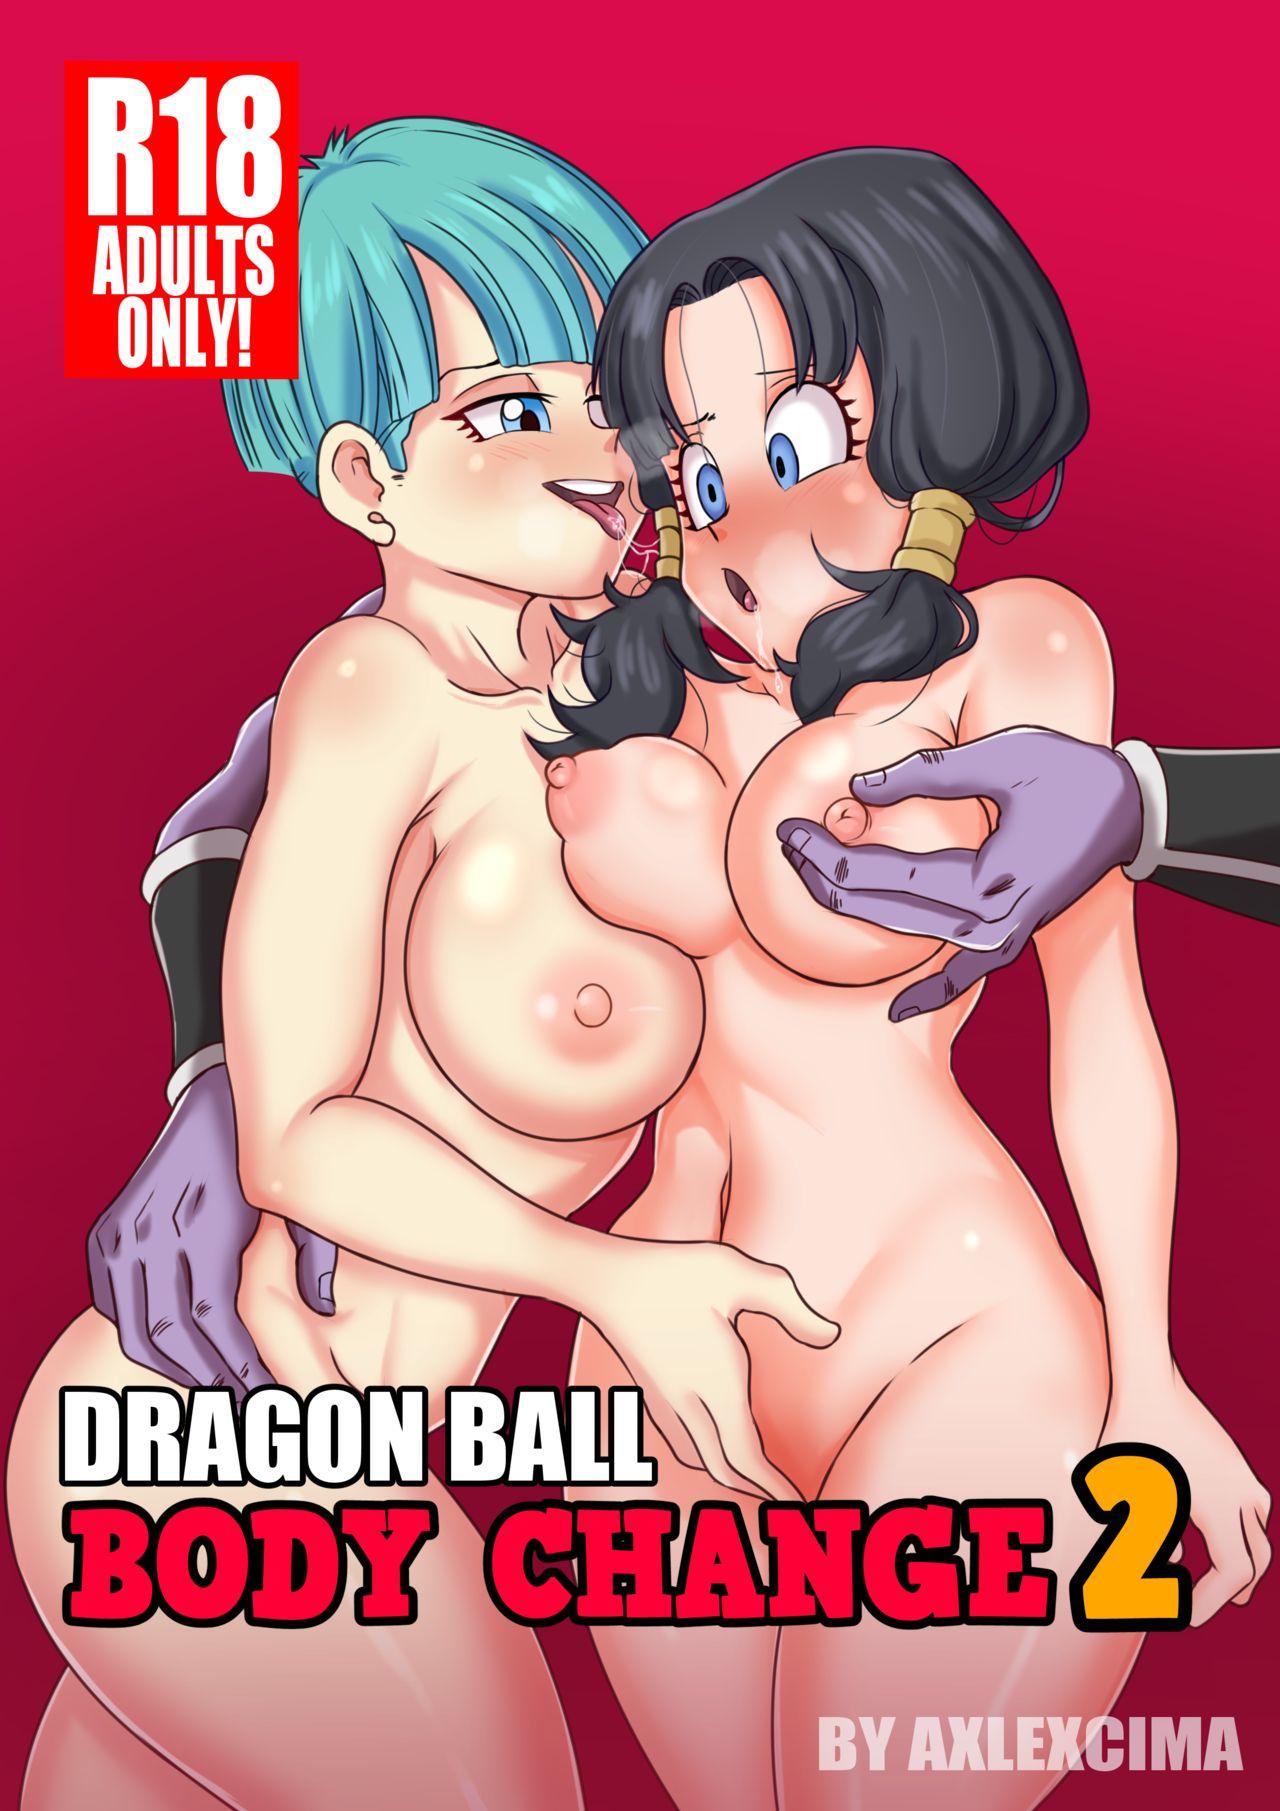 Ball hentai dragon anime Dragon Ball